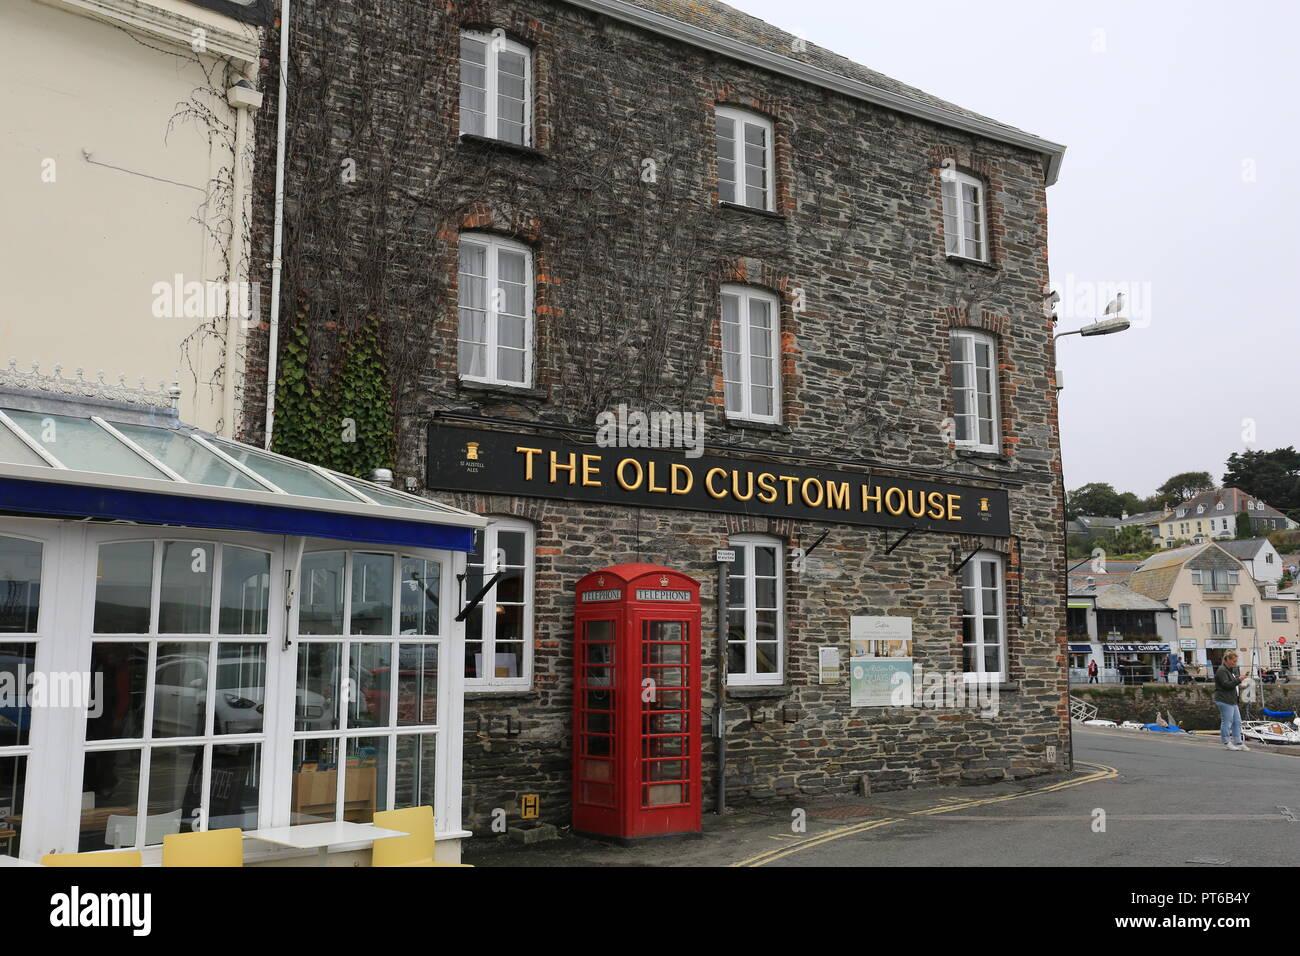 The Old Custom House Stock Photo Alamy